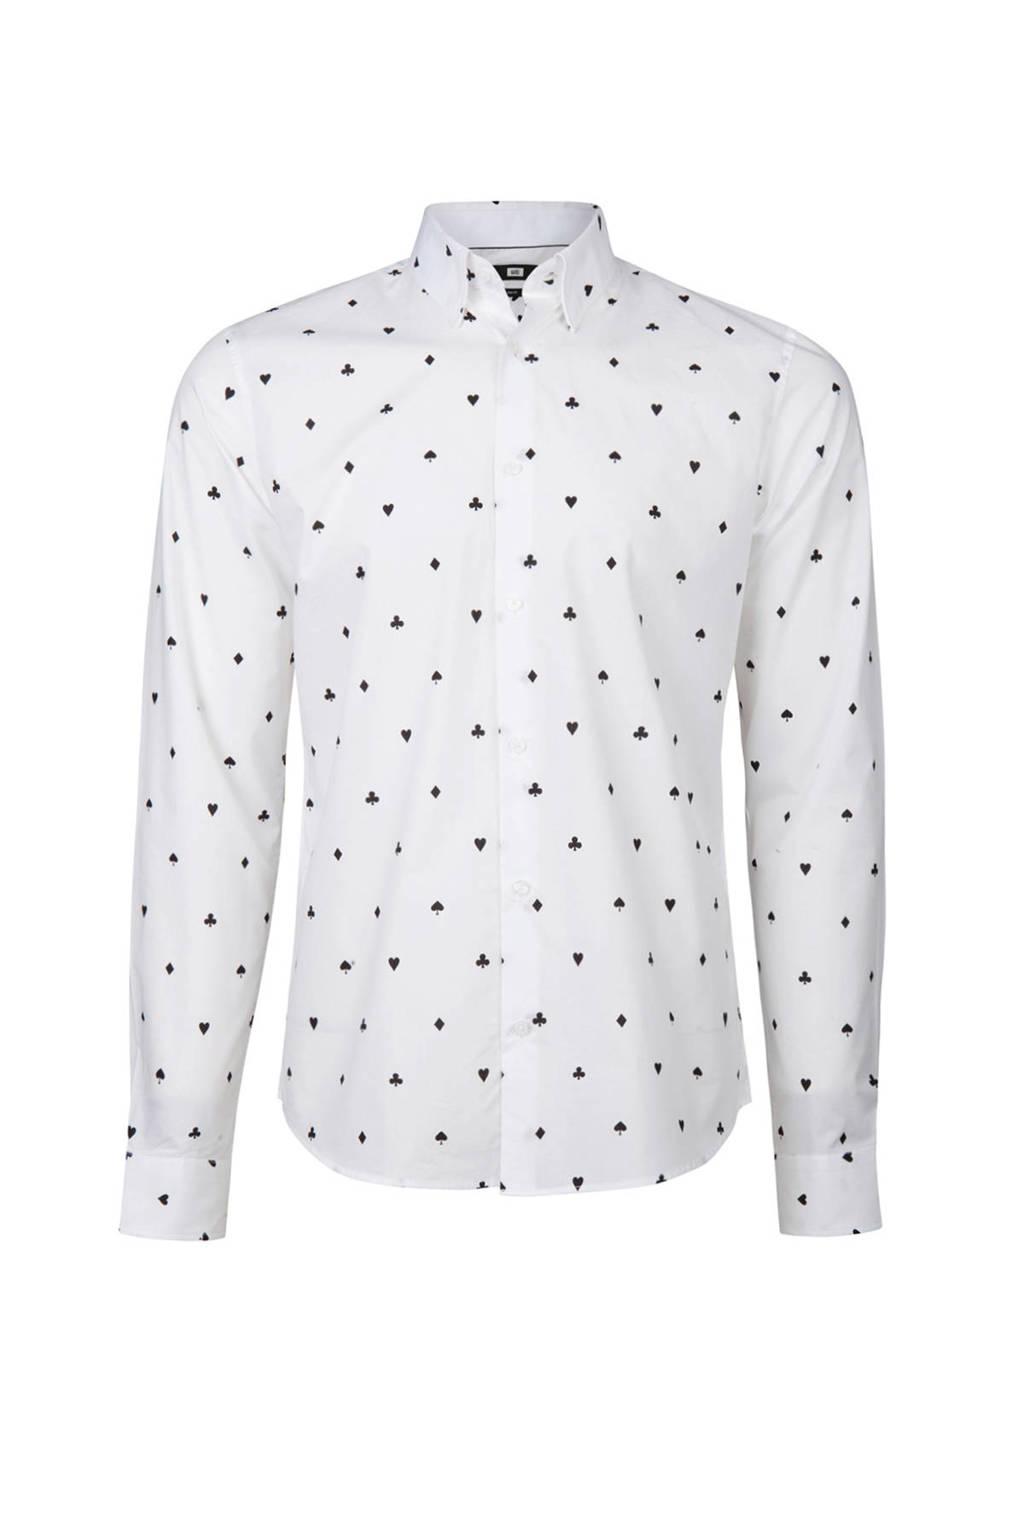 Zwart Overhemd We.We Fashion Slim Fit Overhemd Met Print Wit Wehkamp